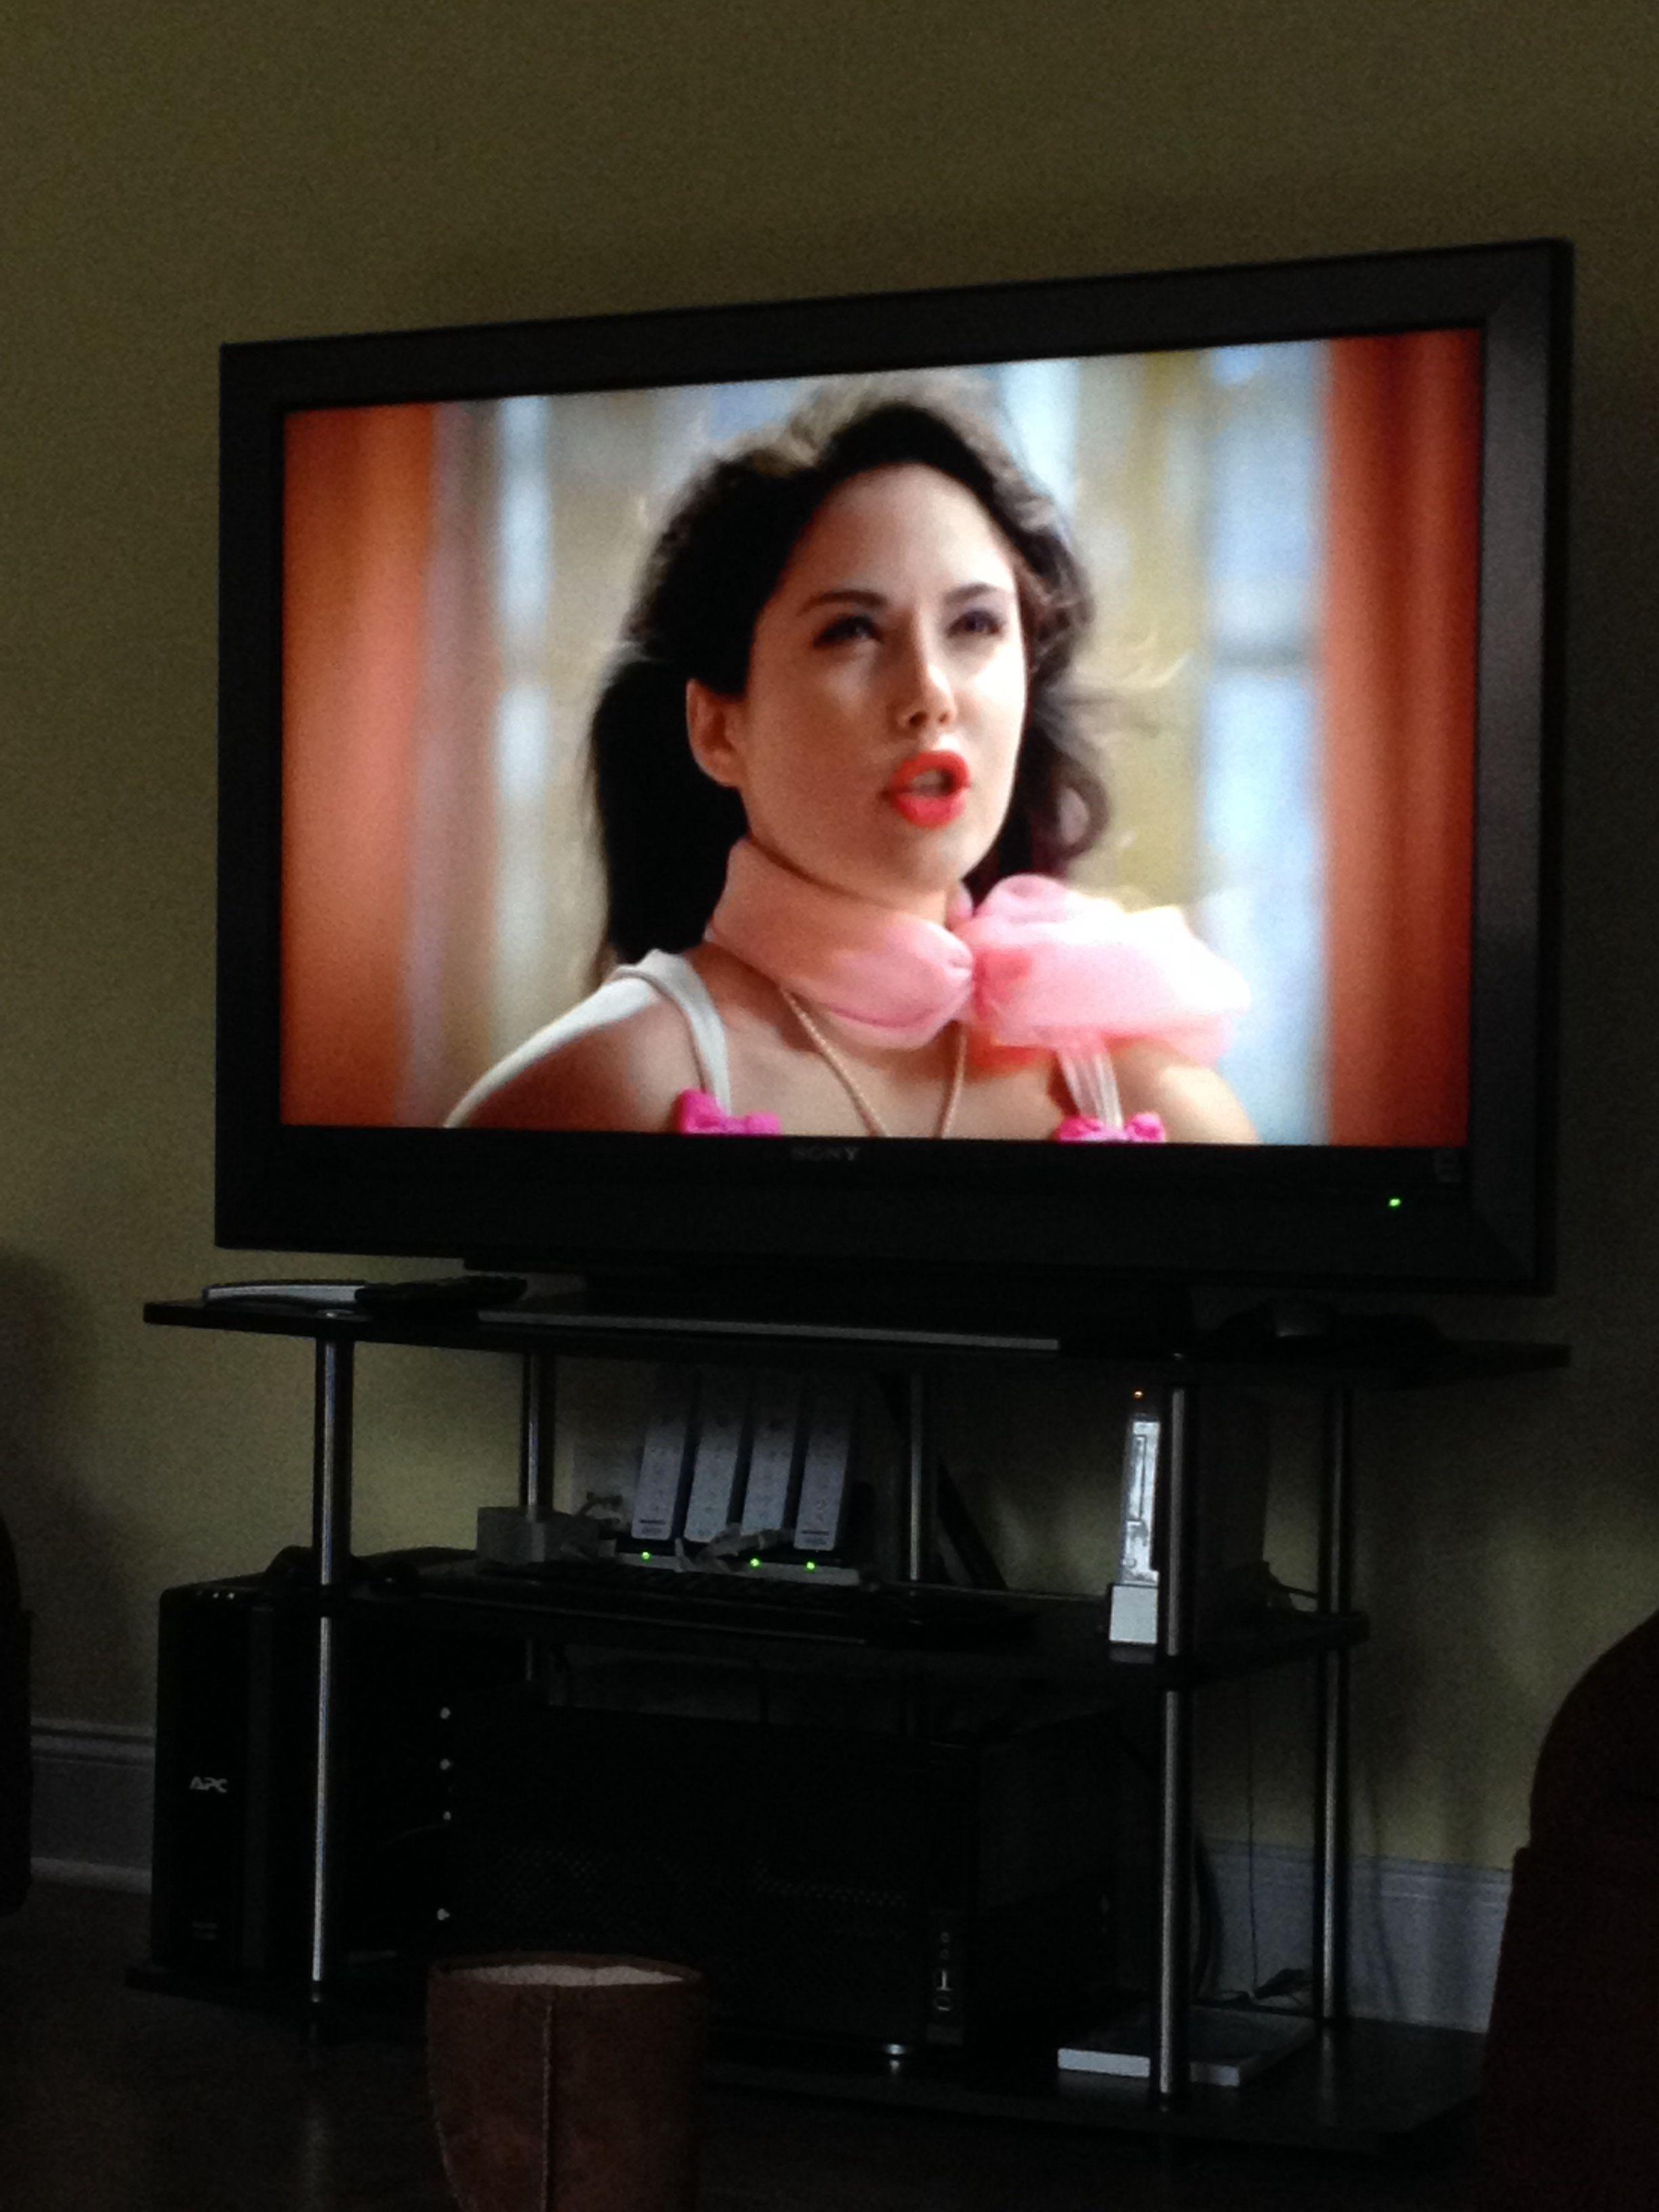 Gracia GomezCortazar Phipps What movie am I watching